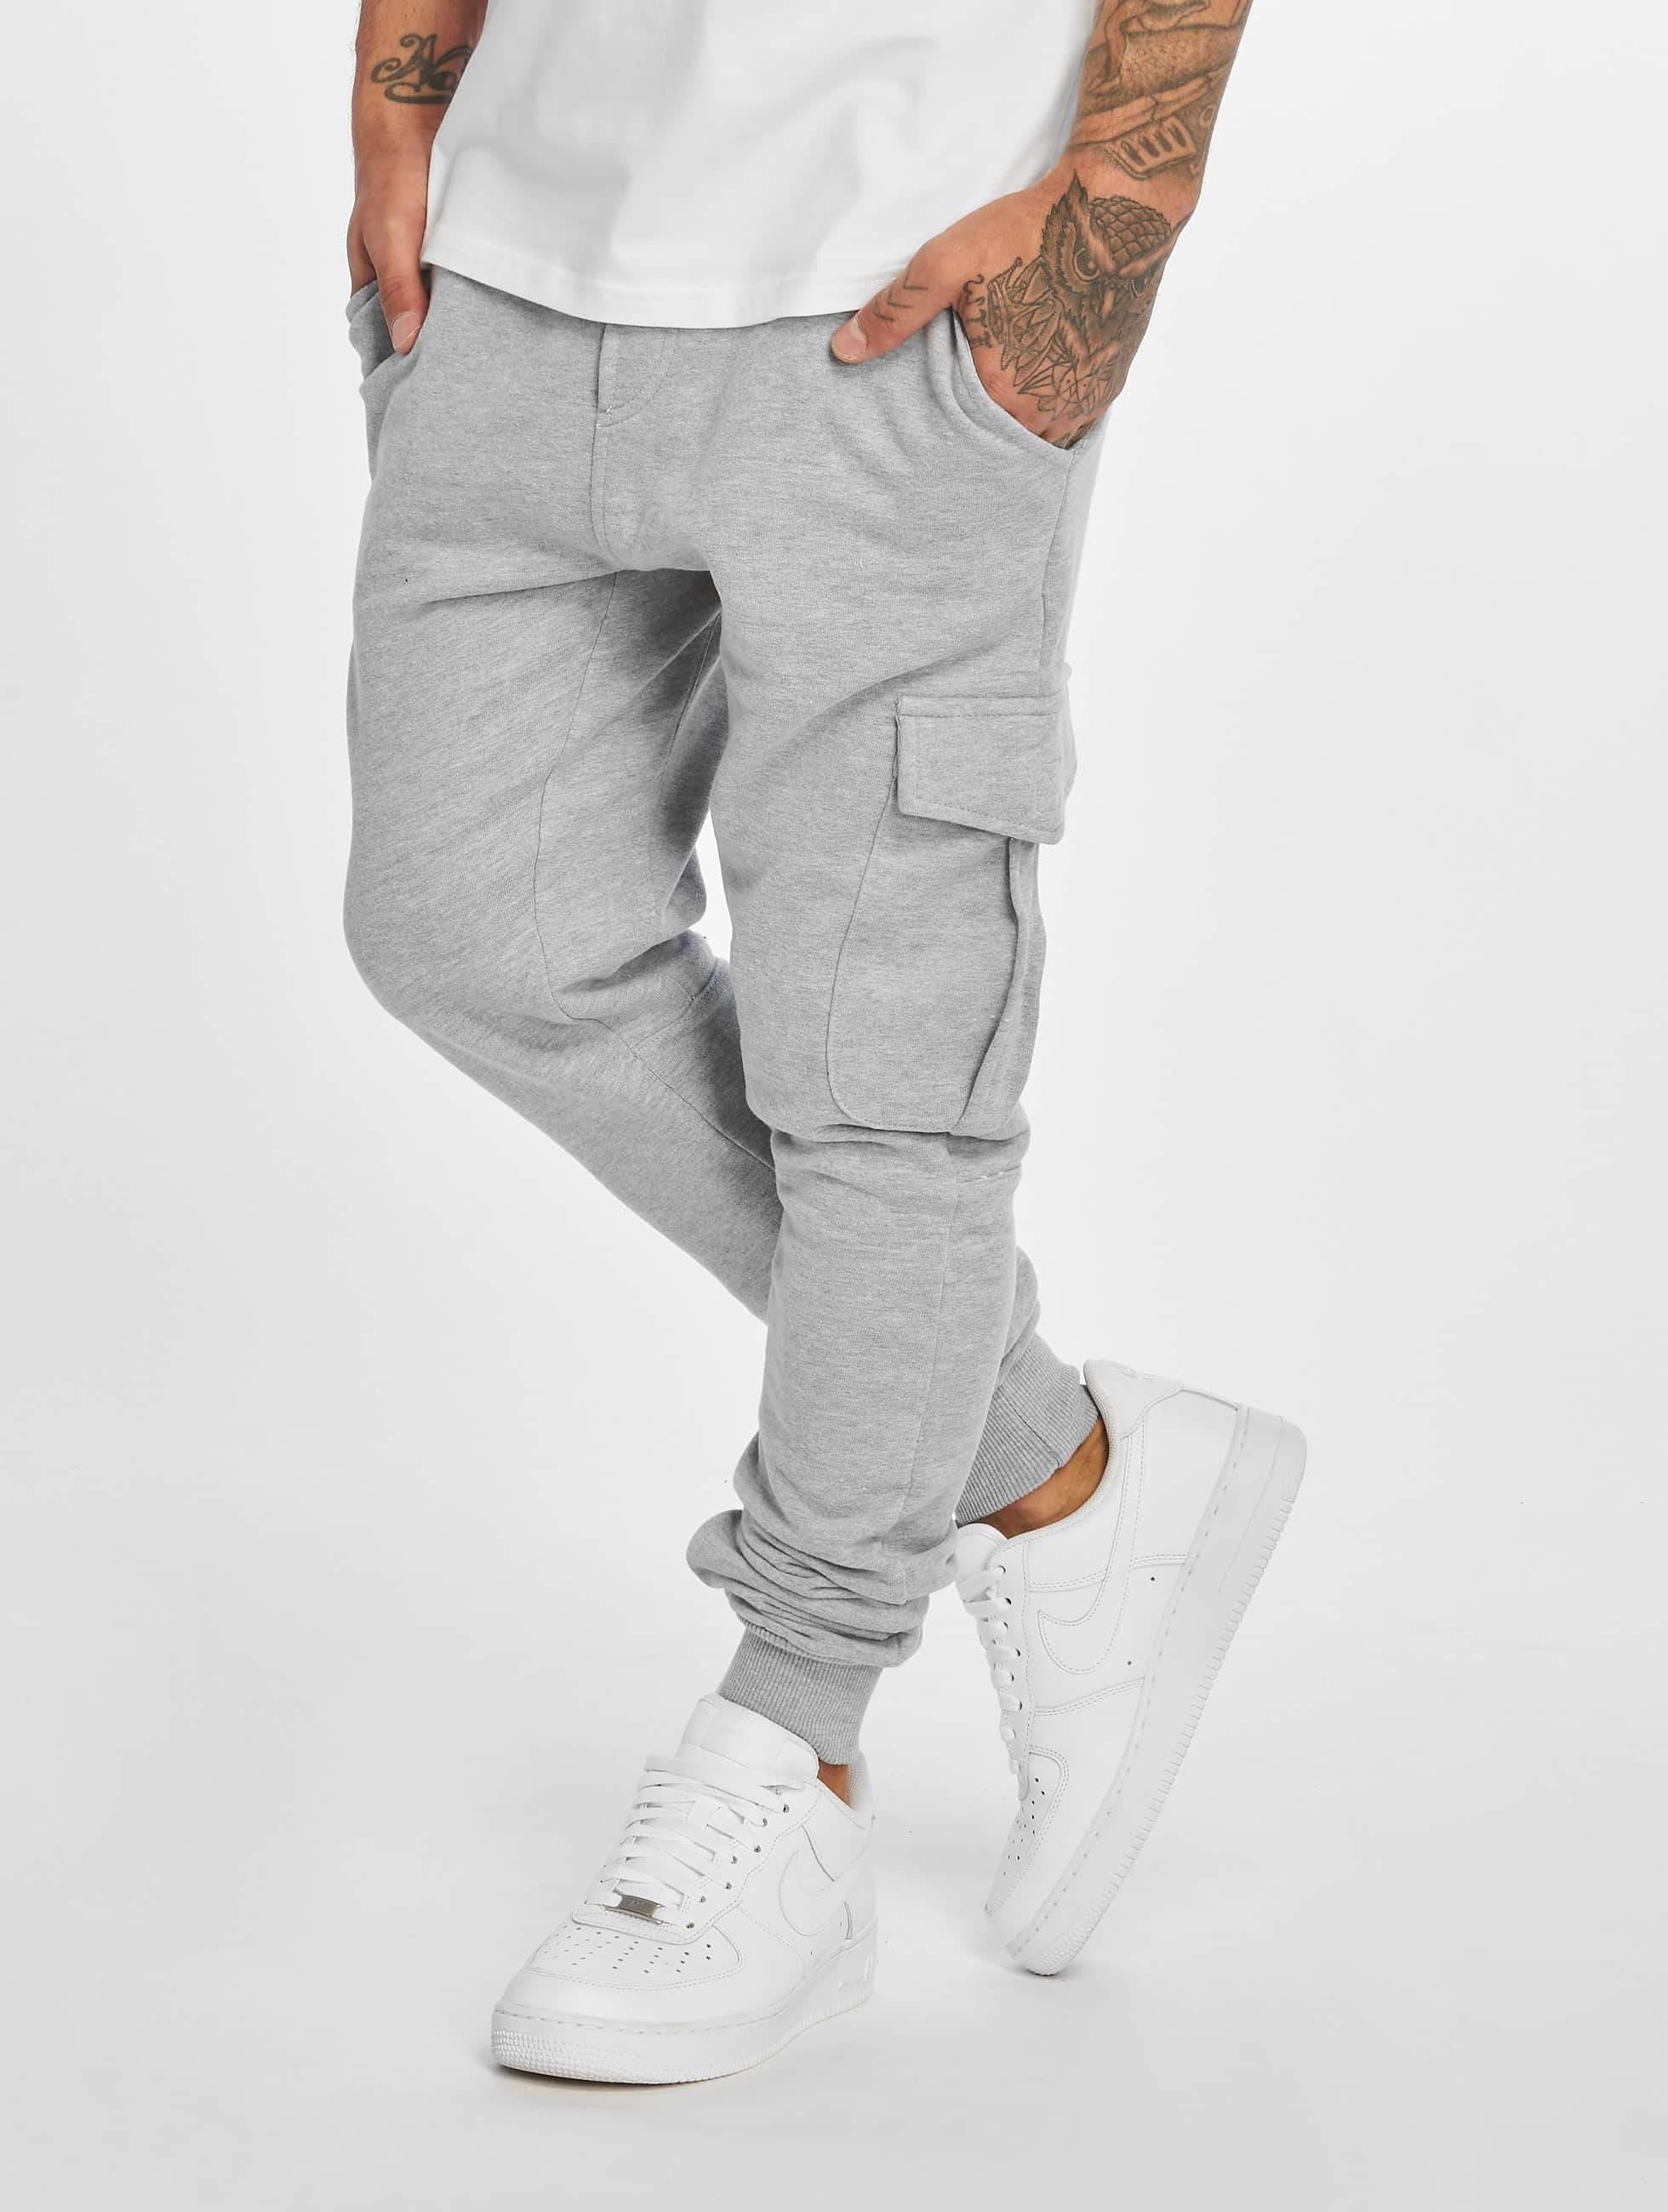 DEF / Sweat Pant Gringo in grey XL